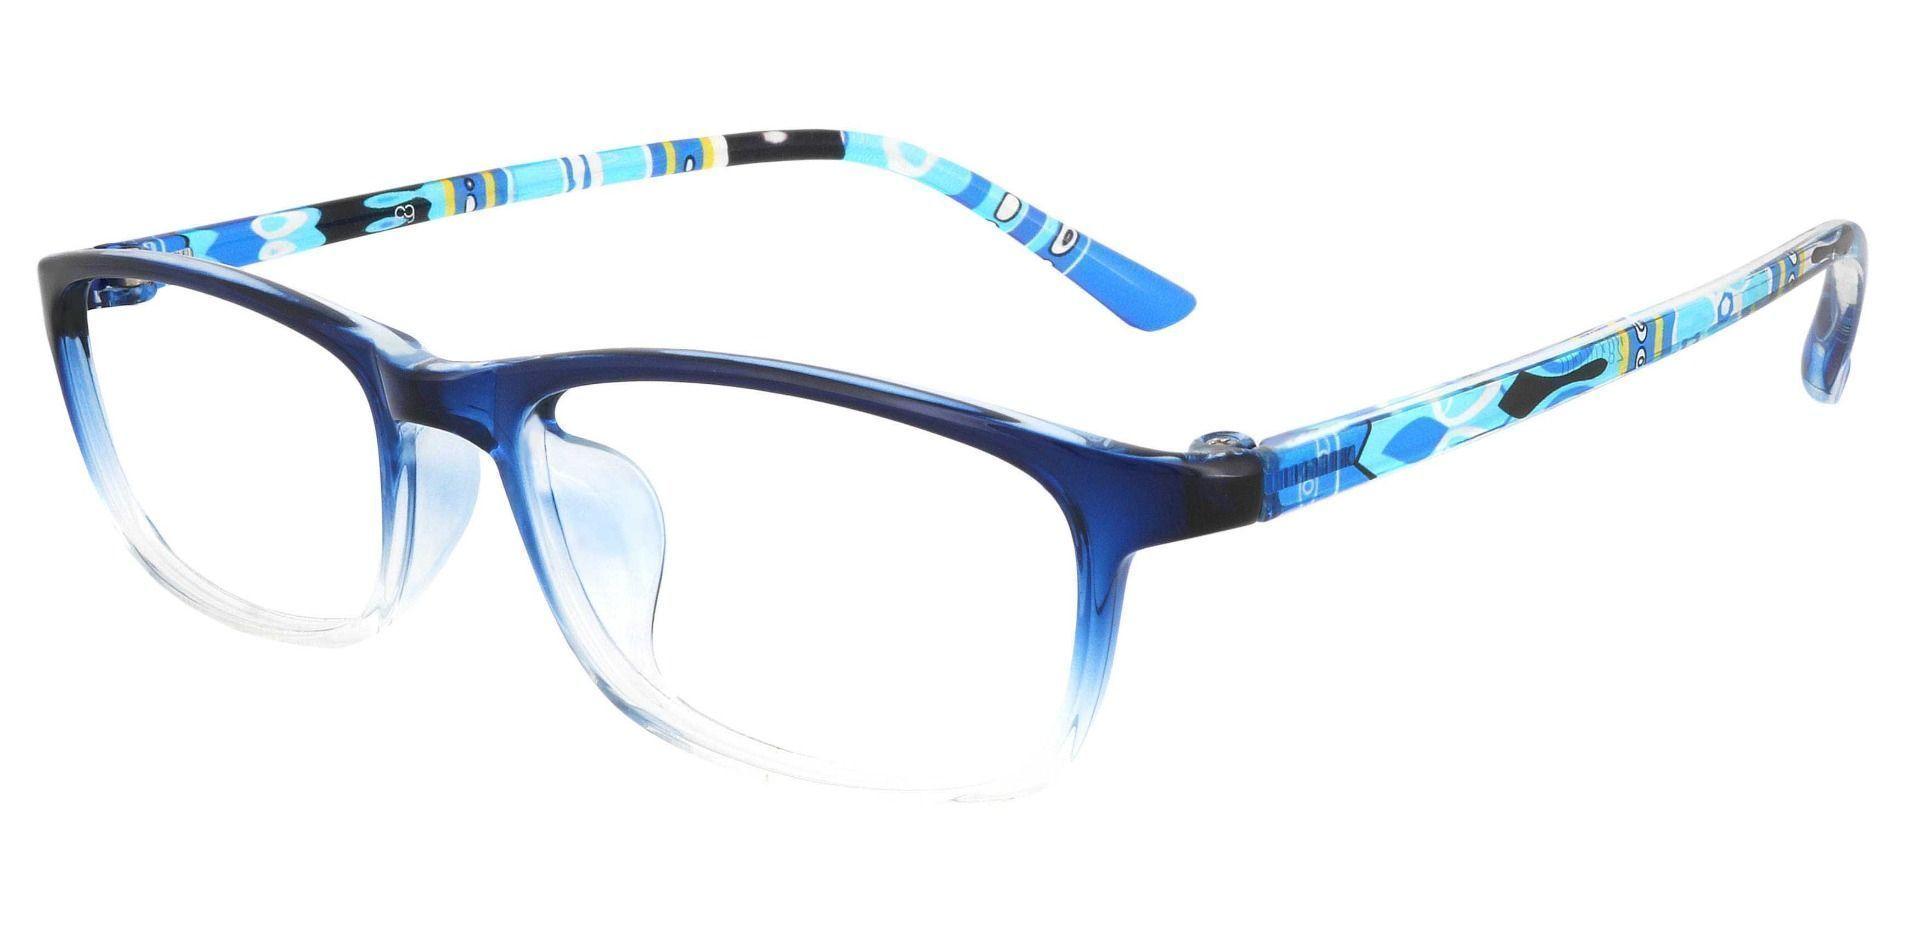 Trinity Rectangle Prescription Glasses - Navy Crystal Fade/Multi Color Temple